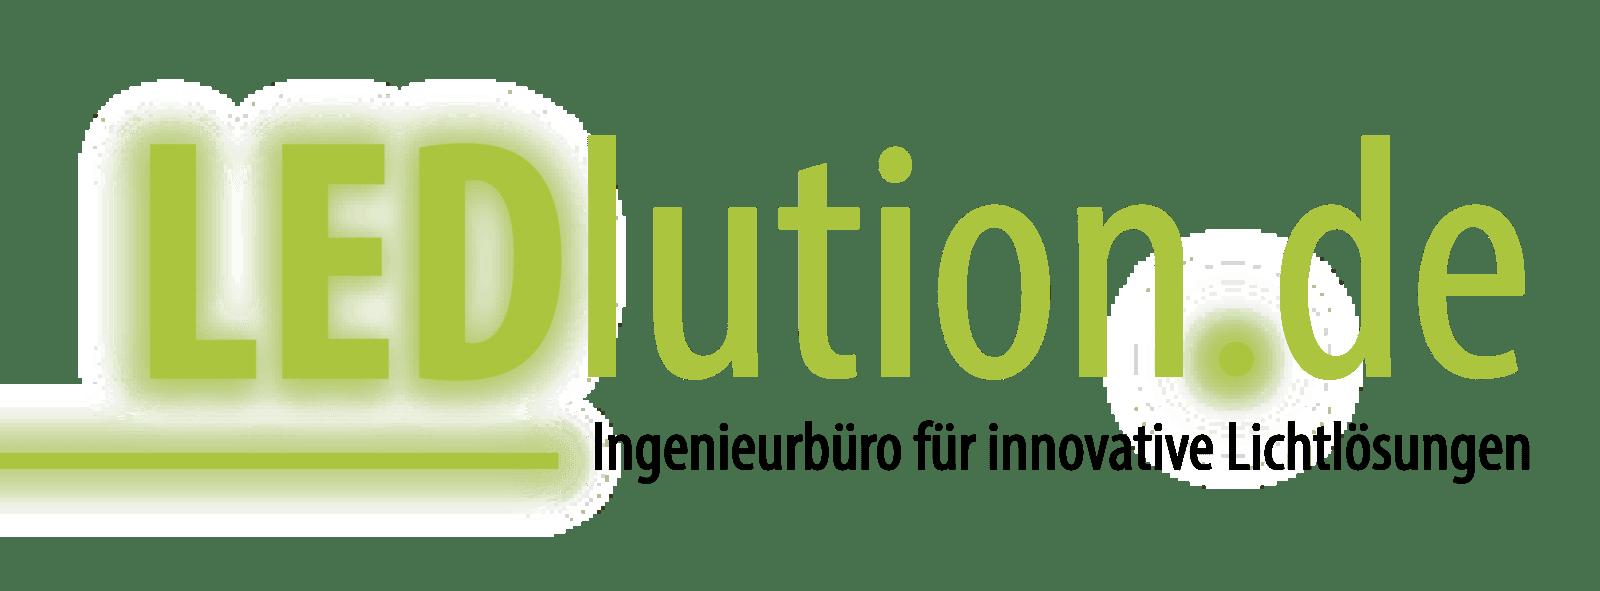 LEDlution